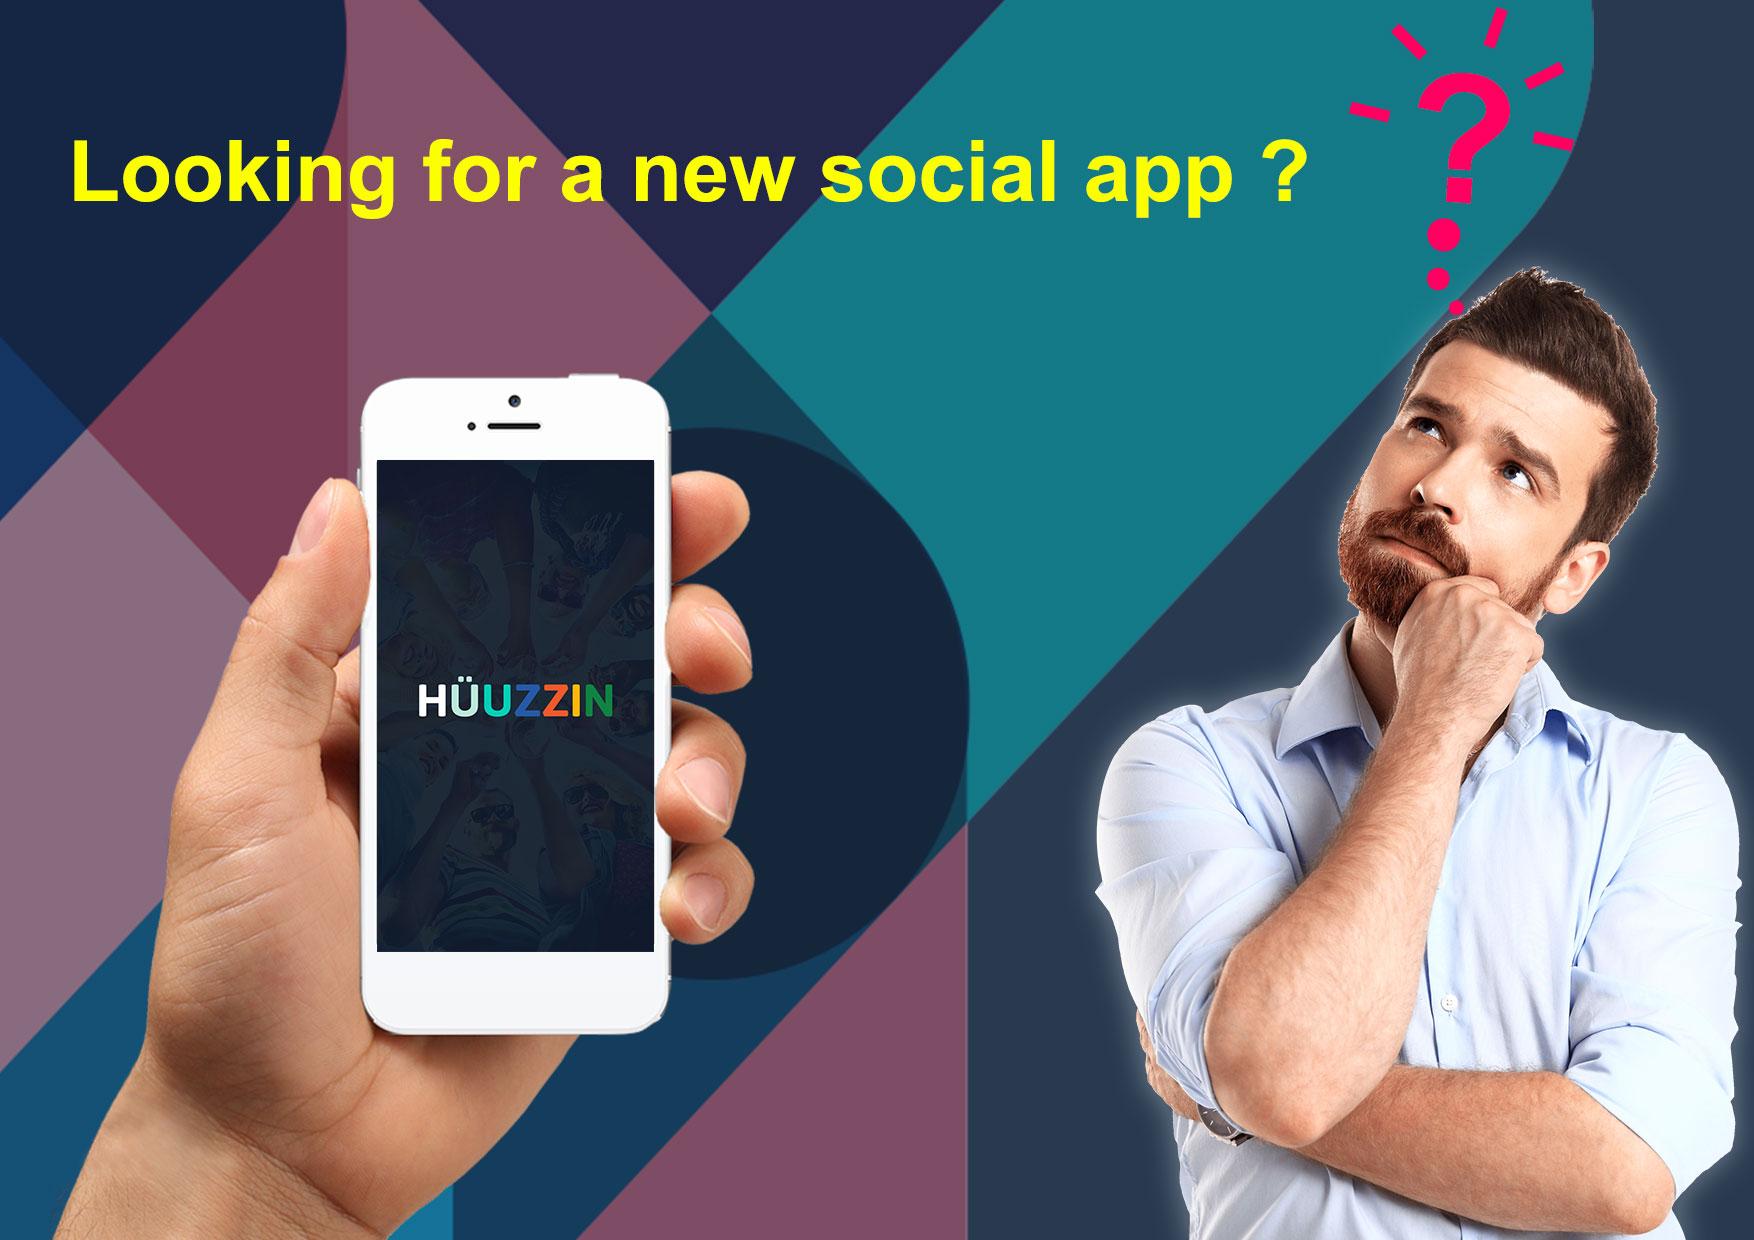 Huzzin app